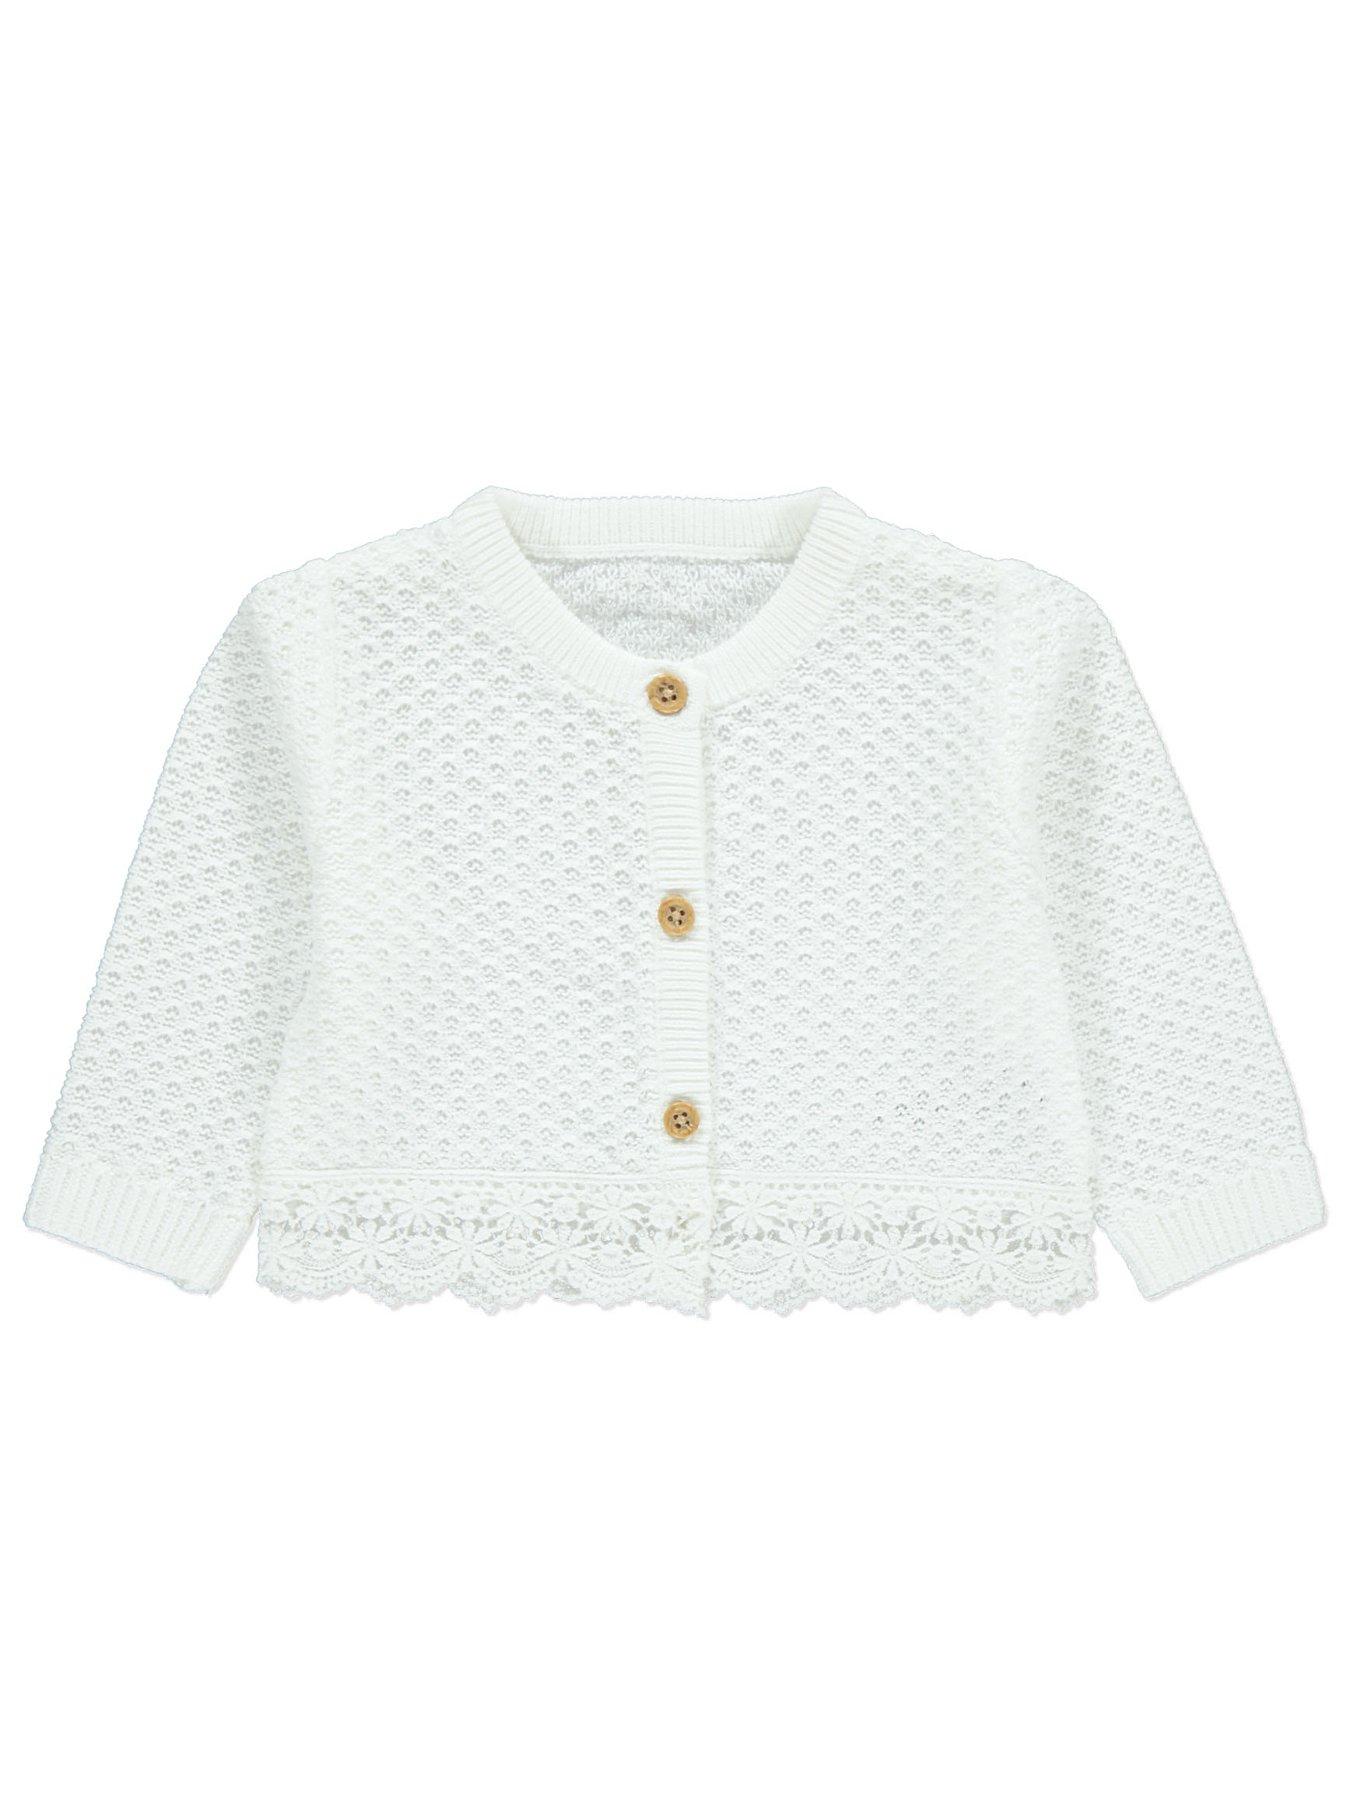 White Crochet Trim Cardigan Baby George